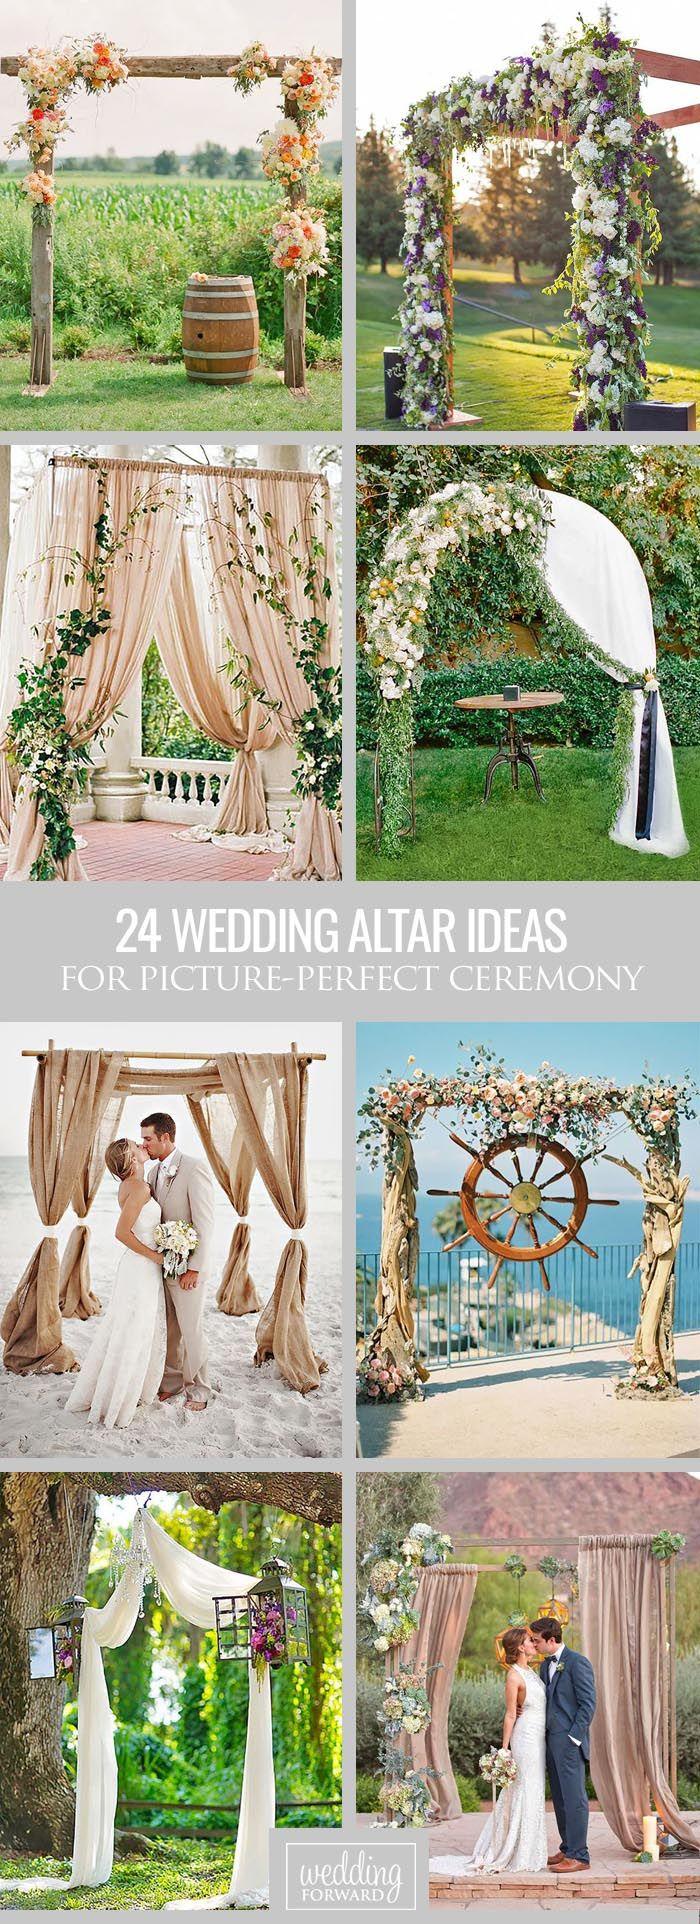 best wedding images on pinterest wedding arches wedding ideas